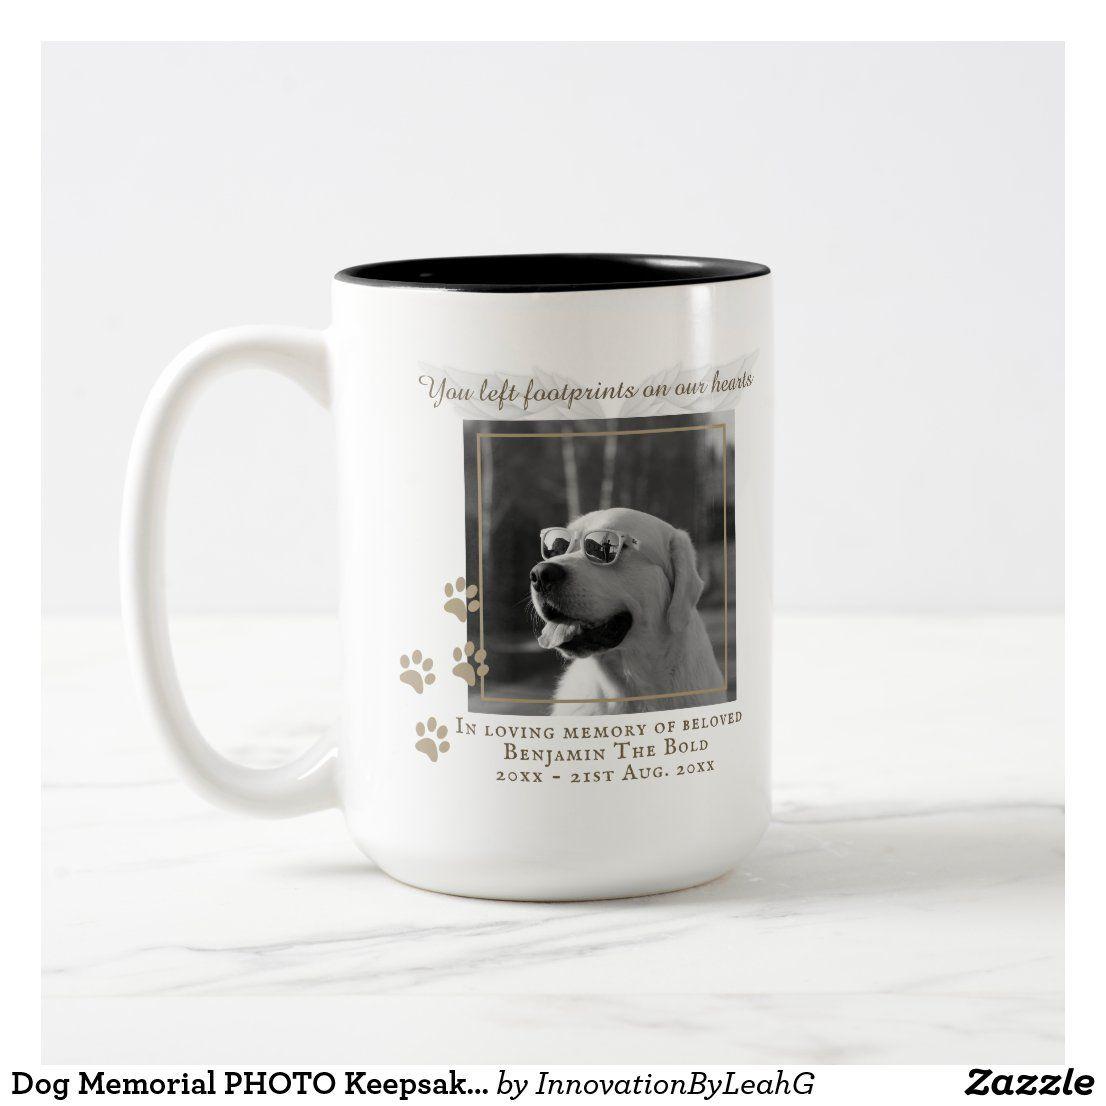 Dog memorial photo keepsake gift add text coffee mug